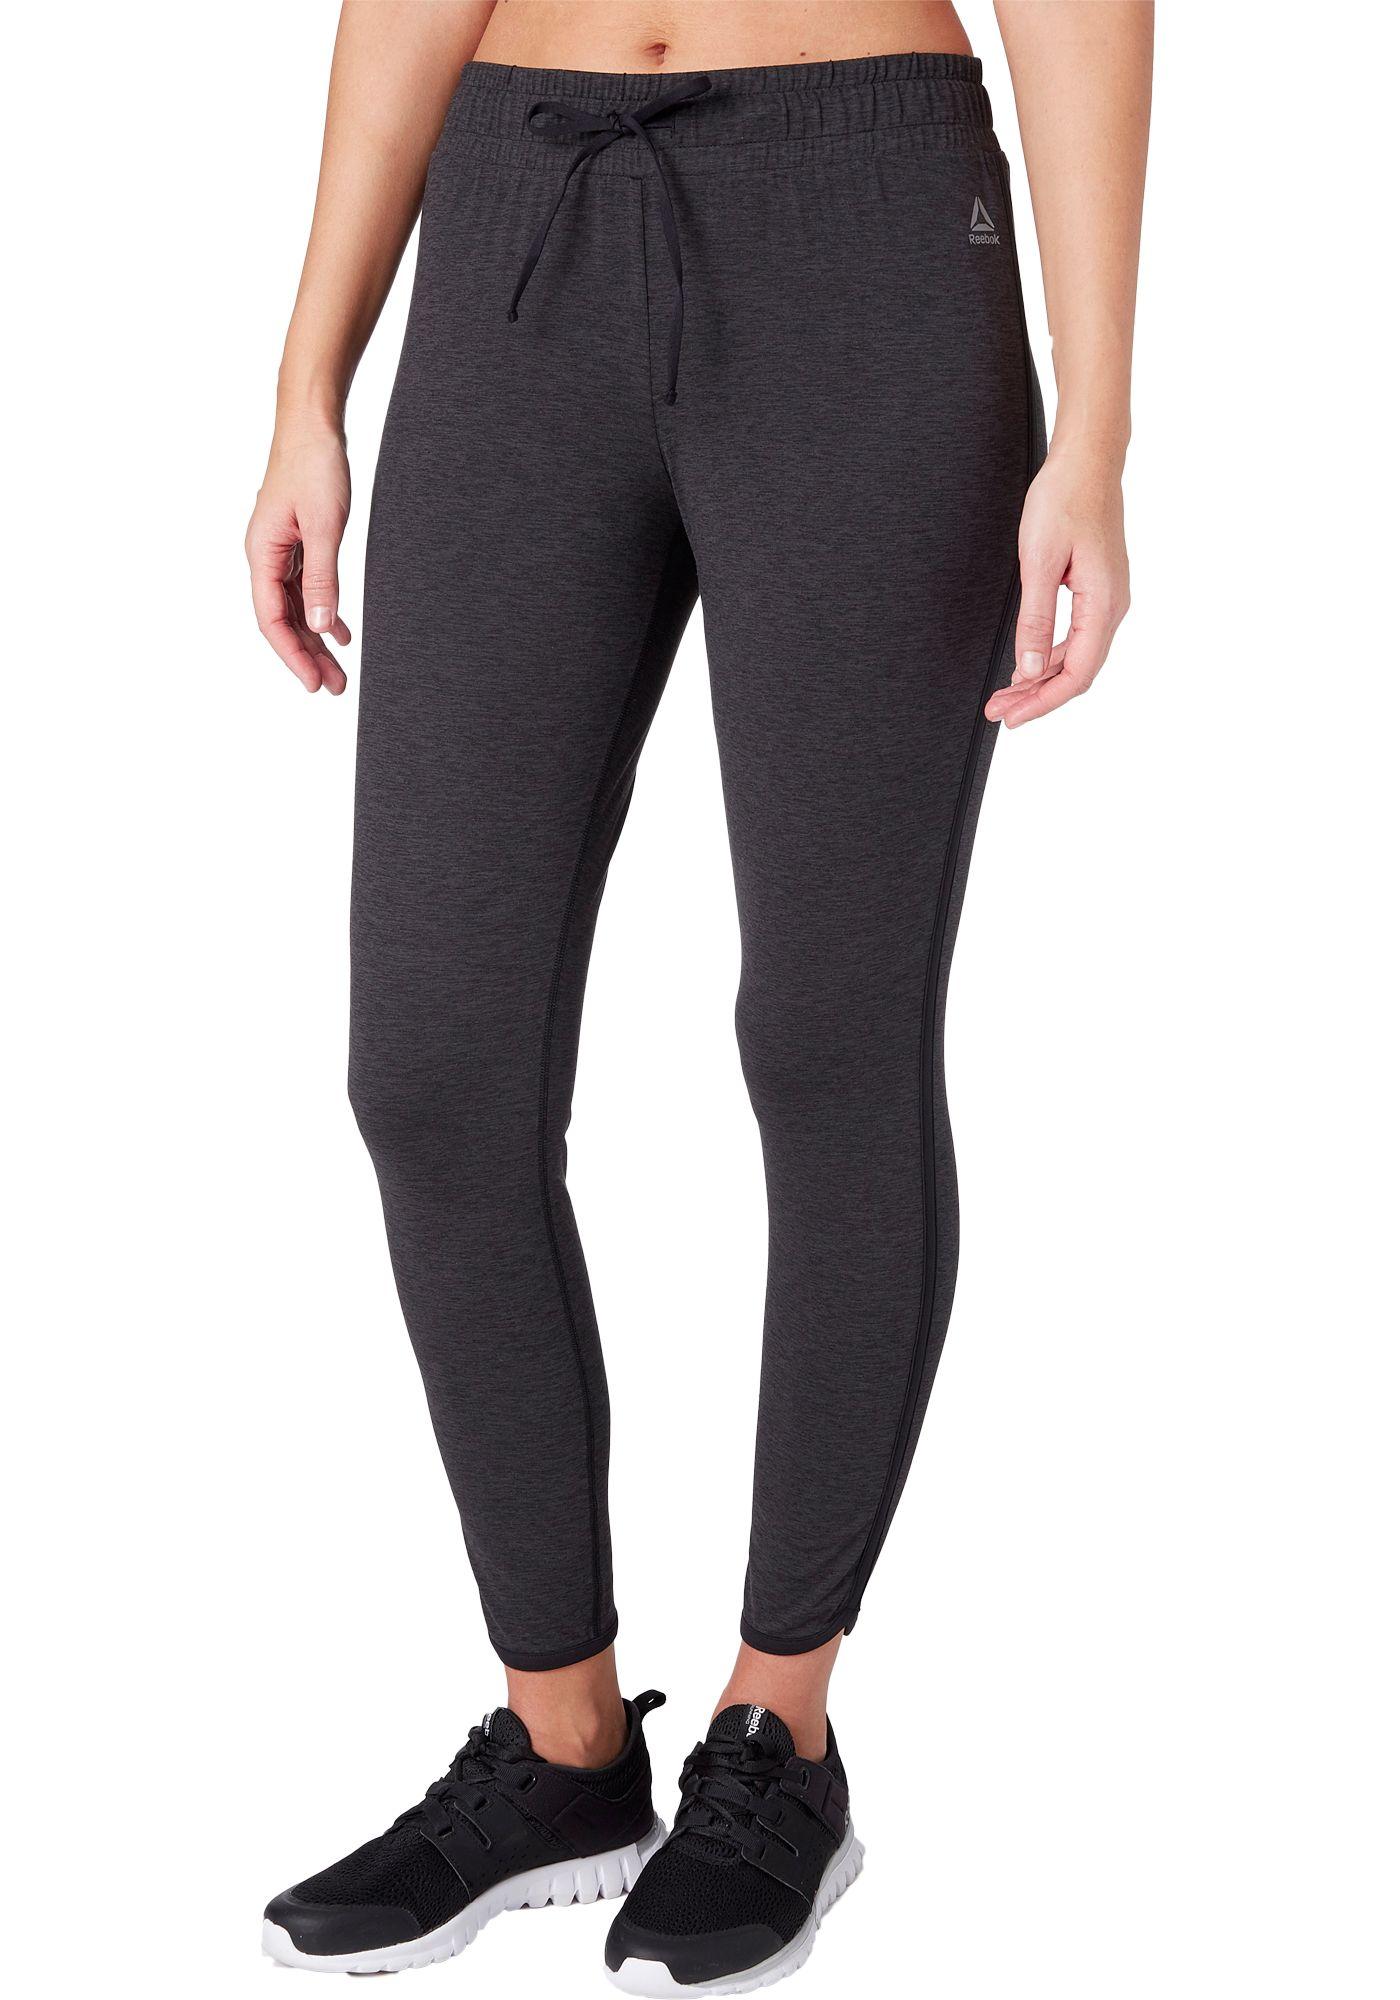 Reebok Women's 24/7 Tulip Hem Pants